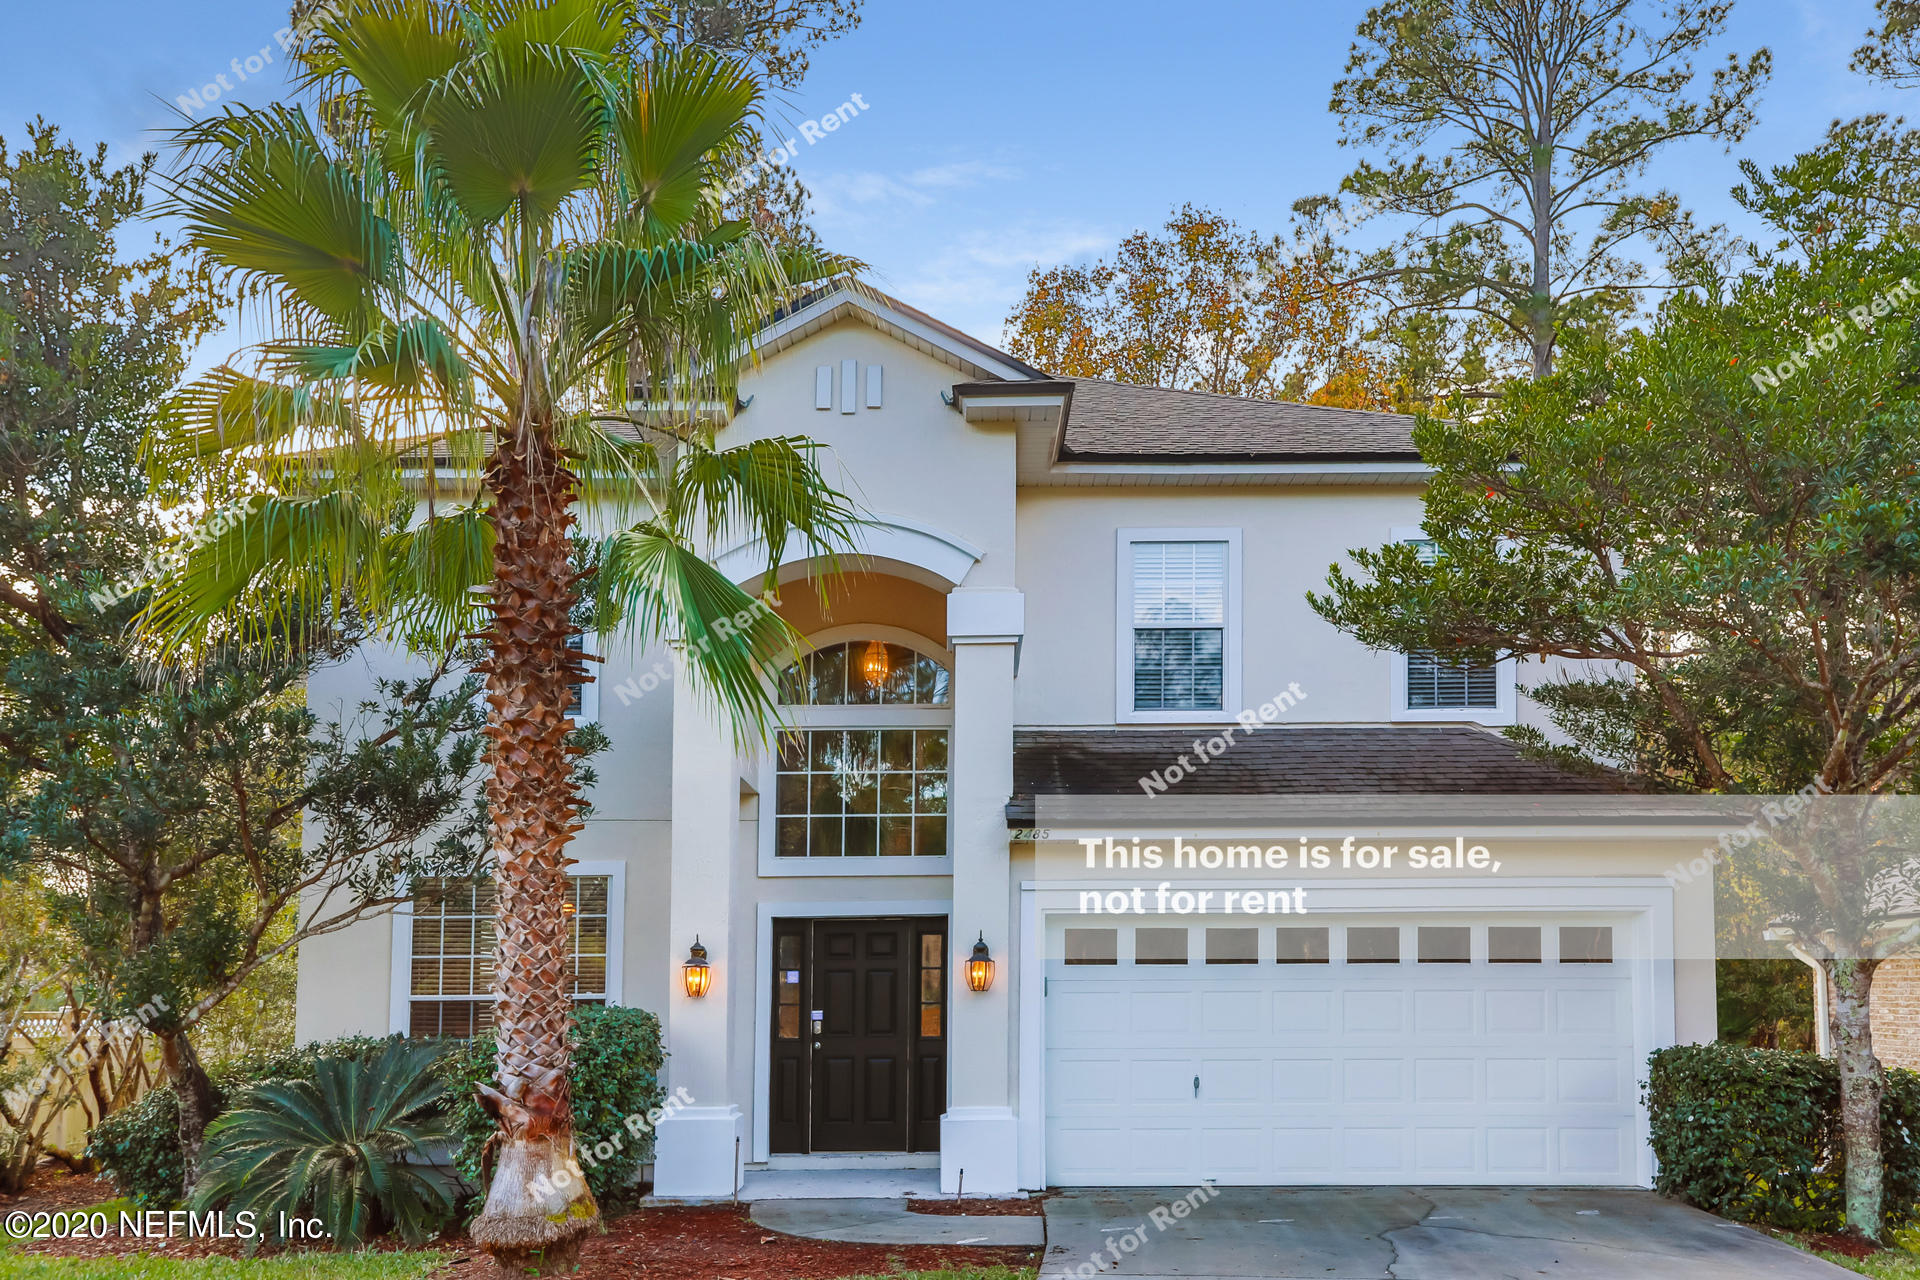 2485 TALL CEDARS, ORANGE PARK, FLORIDA 32003, 4 Bedrooms Bedrooms, ,2 BathroomsBathrooms,Residential,For sale,TALL CEDARS,1088037